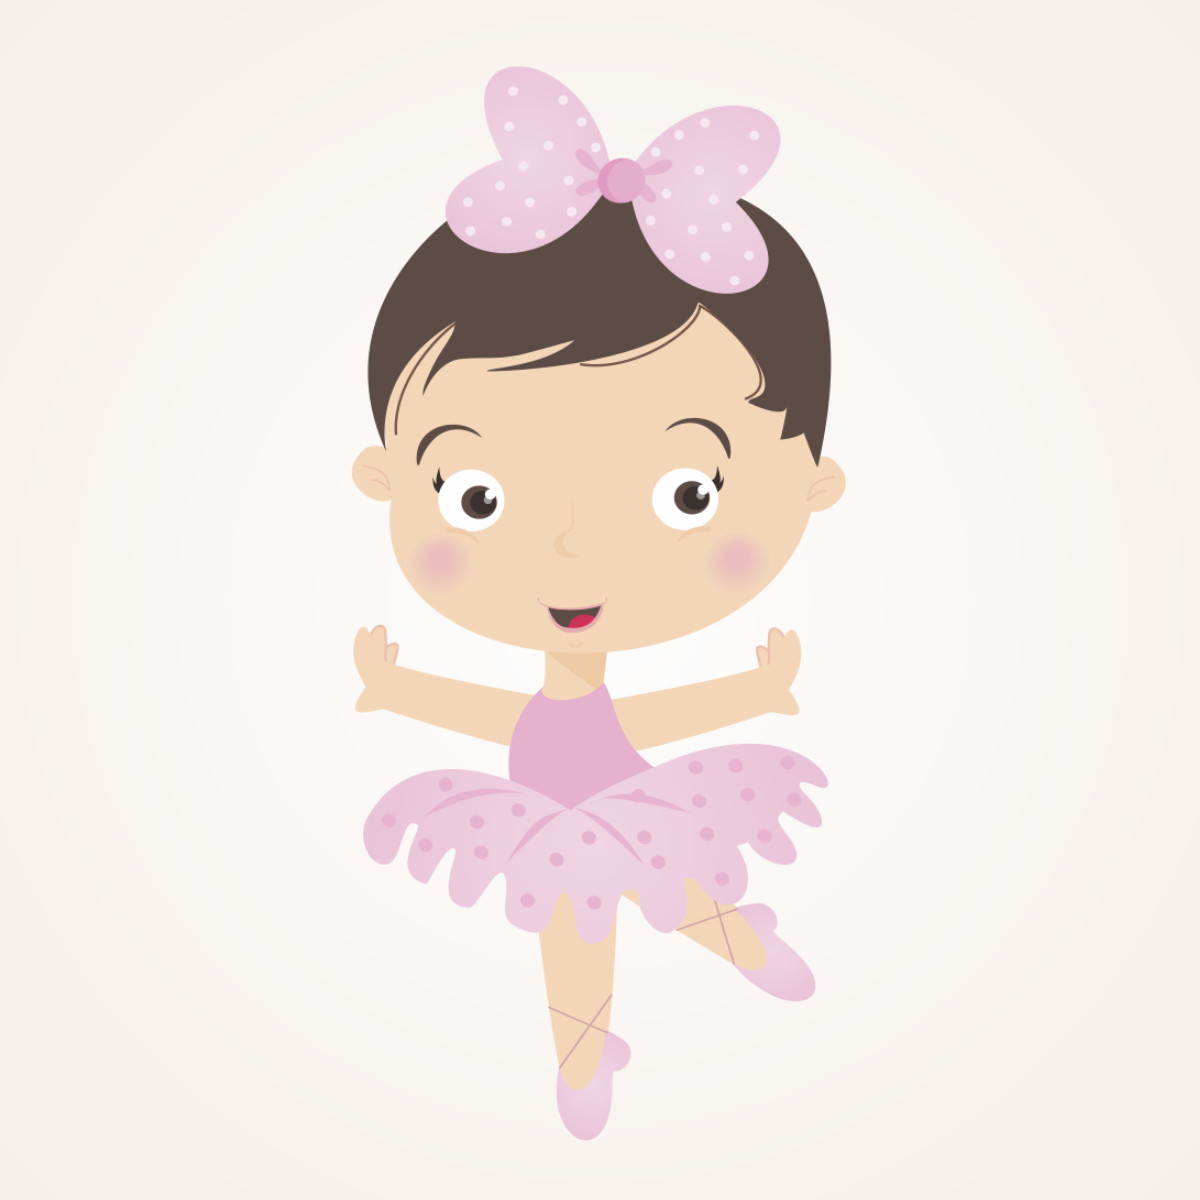 mascote-boneca-digital-desenho-caricatura-cartao-de-visitas-logotipo-logomarca.jpg